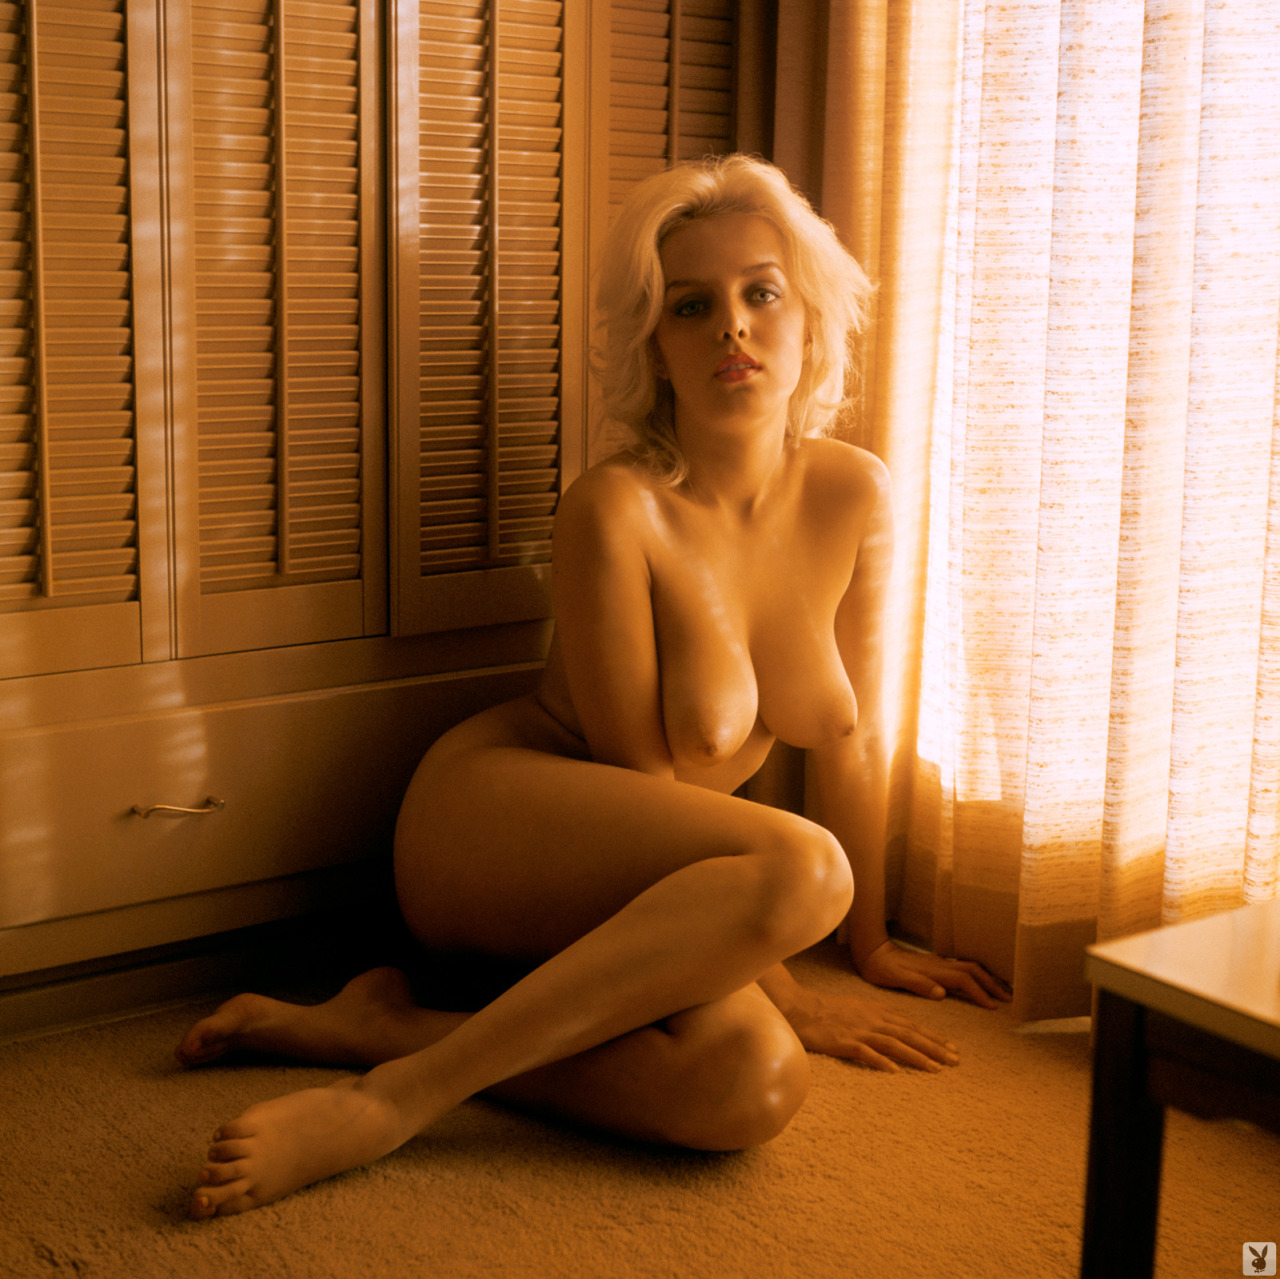 Linda nude caeter 9